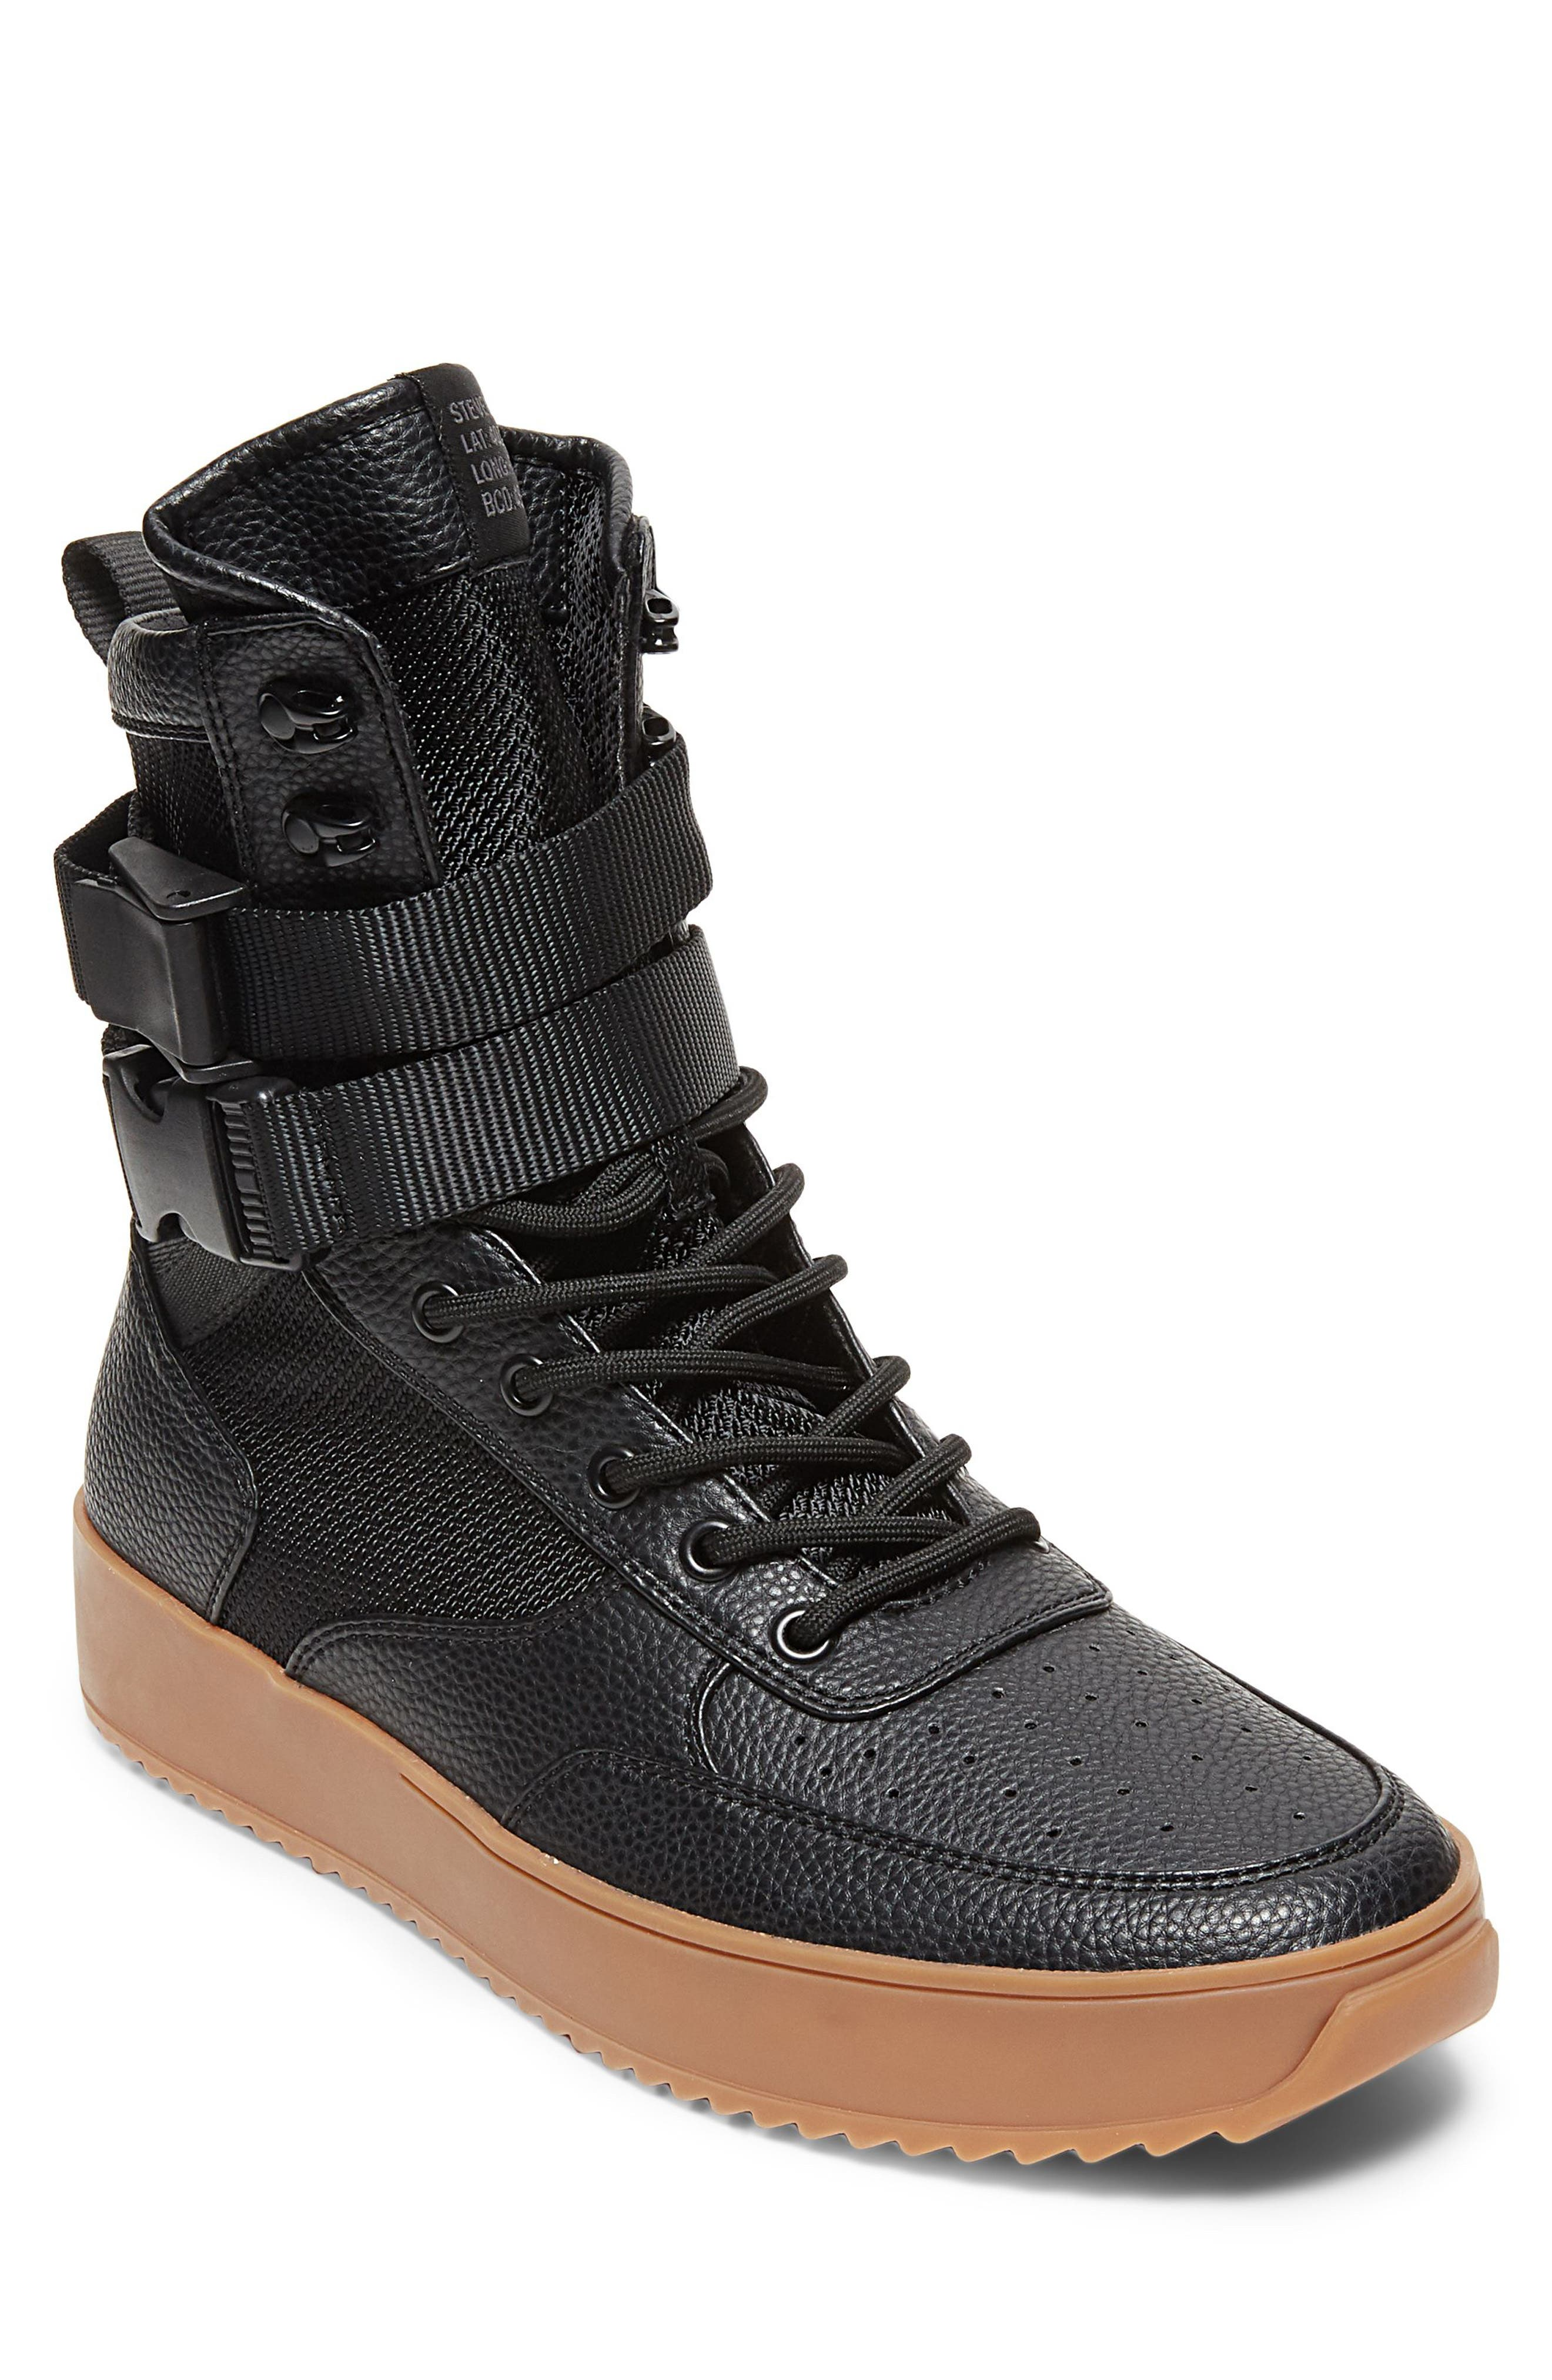 Zeroday Sneaker,                         Main,                         color, Black